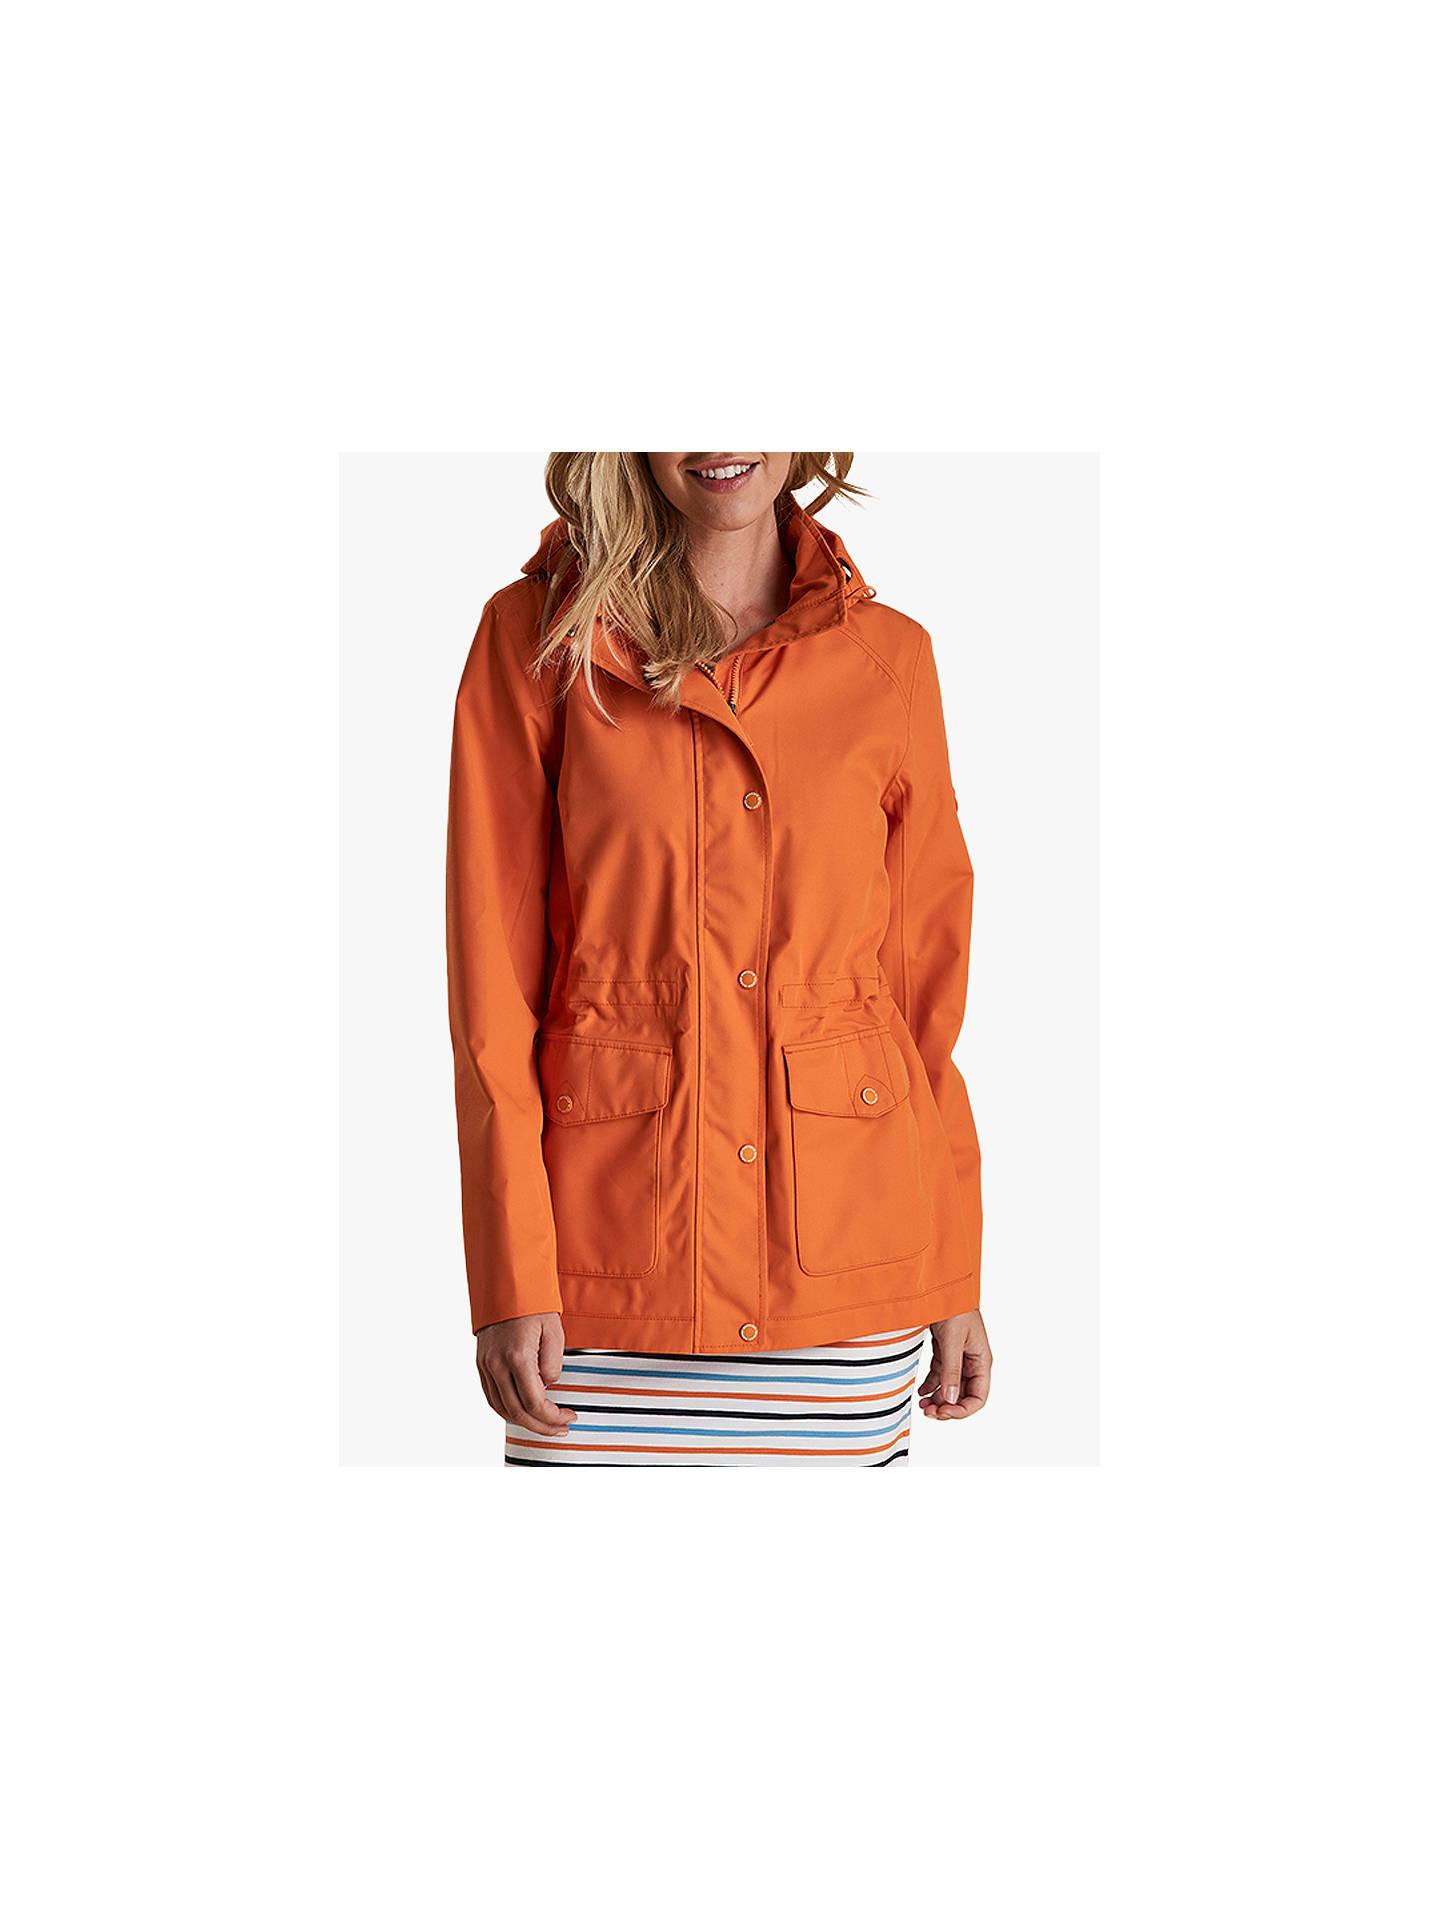 4f39a92c4 Buy Barbour Backshore Waterproof Hooded Jacket, Marigold, 8 Online at  johnlewis.com ...